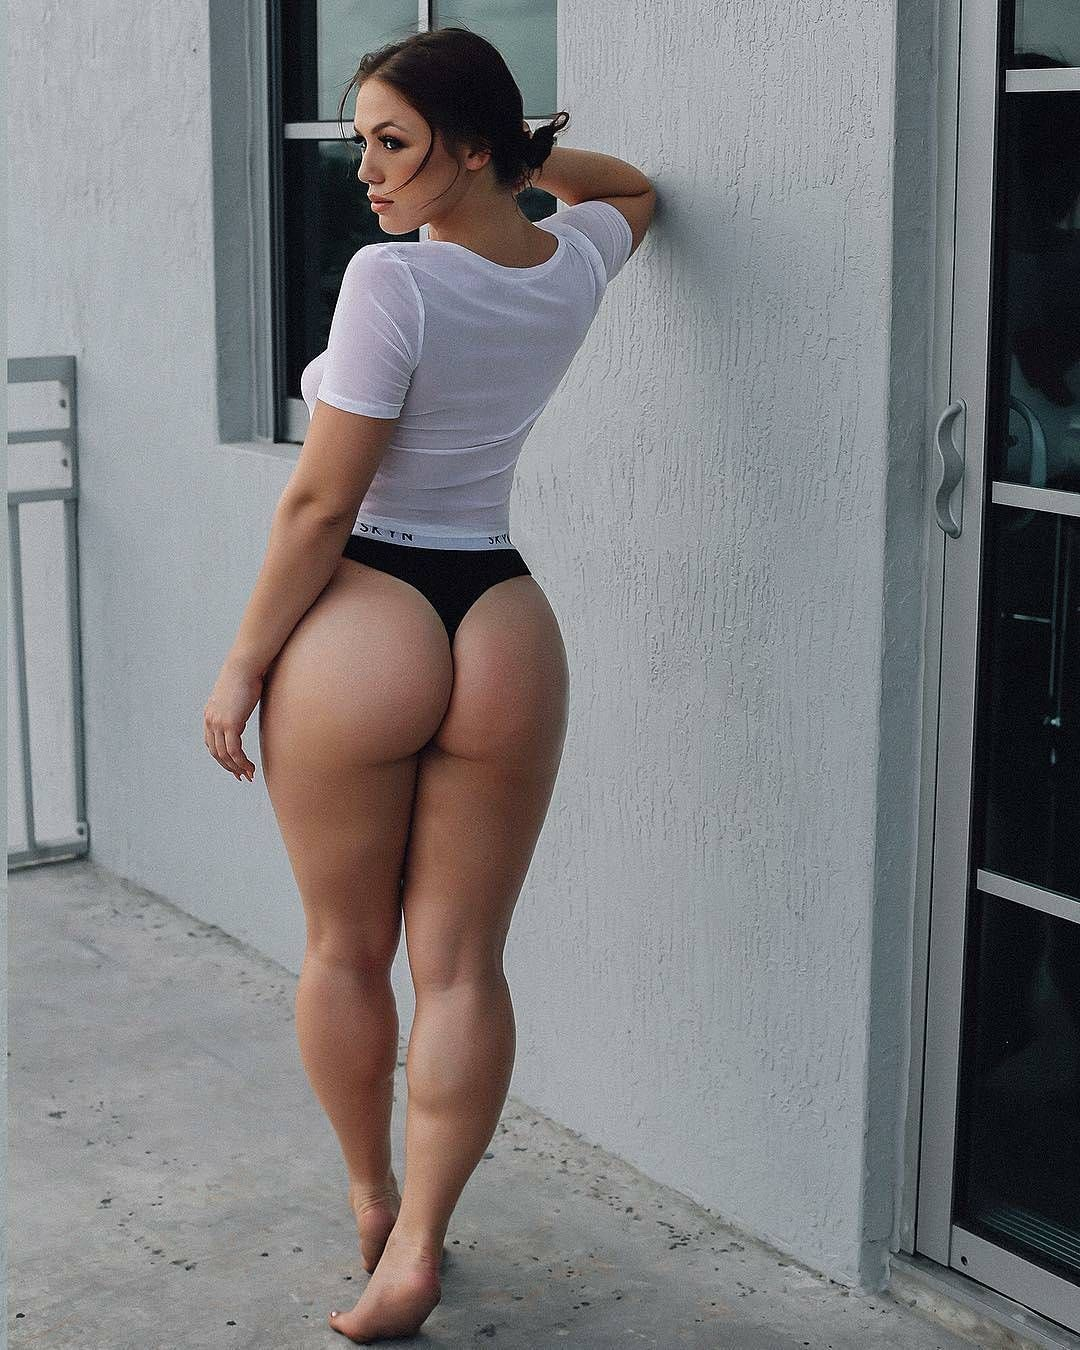 Gorgeous Curvy Brunette Model Anna Matthews Showing Off Her Sexy Ass In A Black Thong